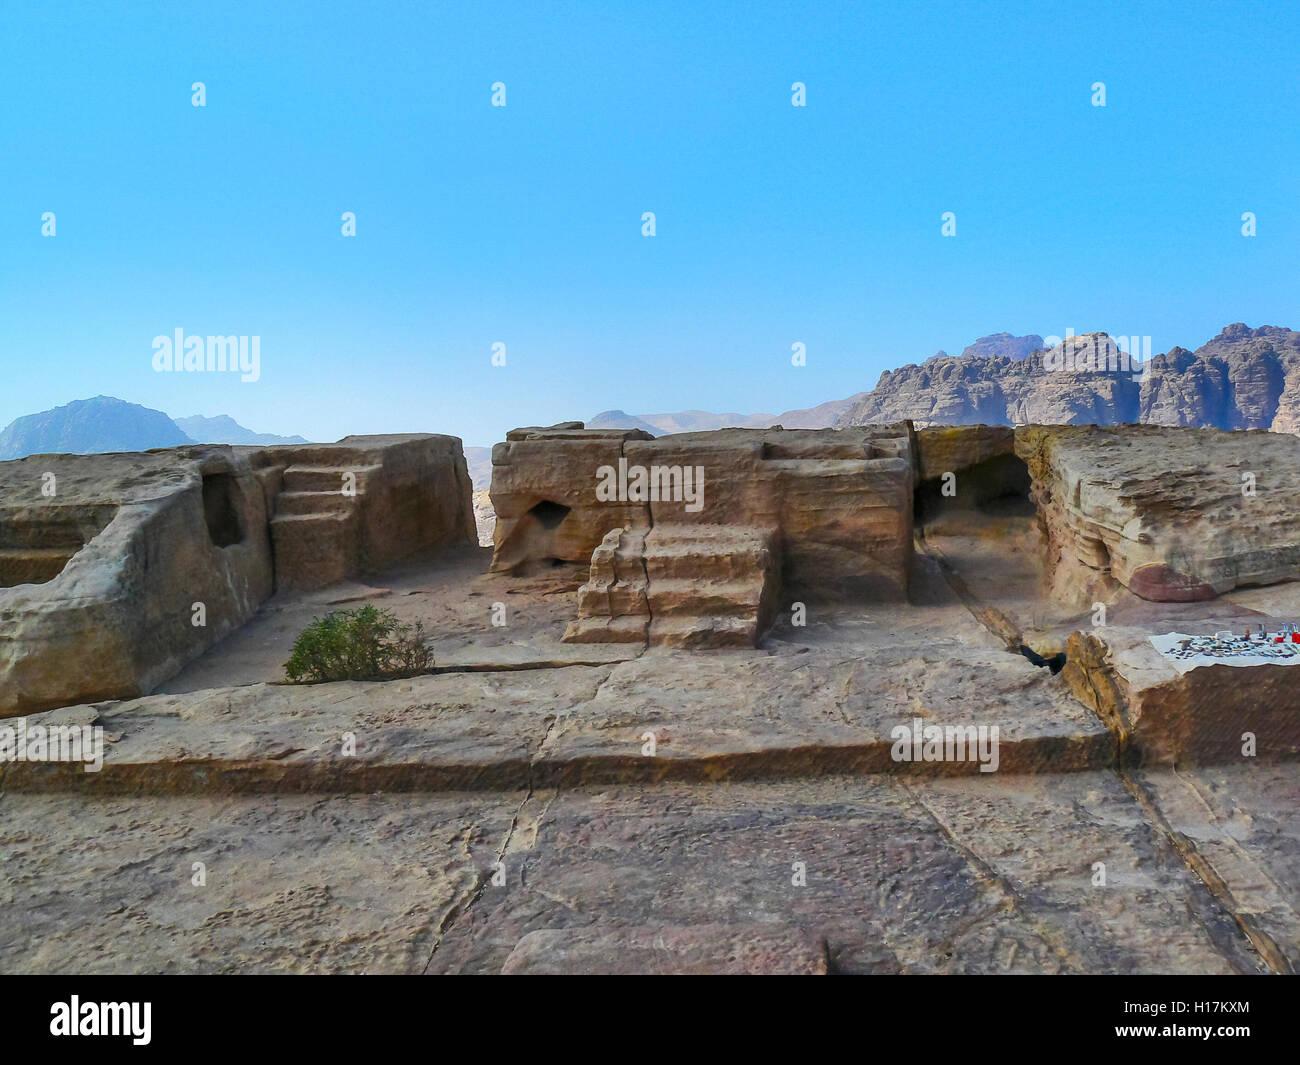 sacrificial altar, ancient cult site at Petra, Jordan - Stock Image